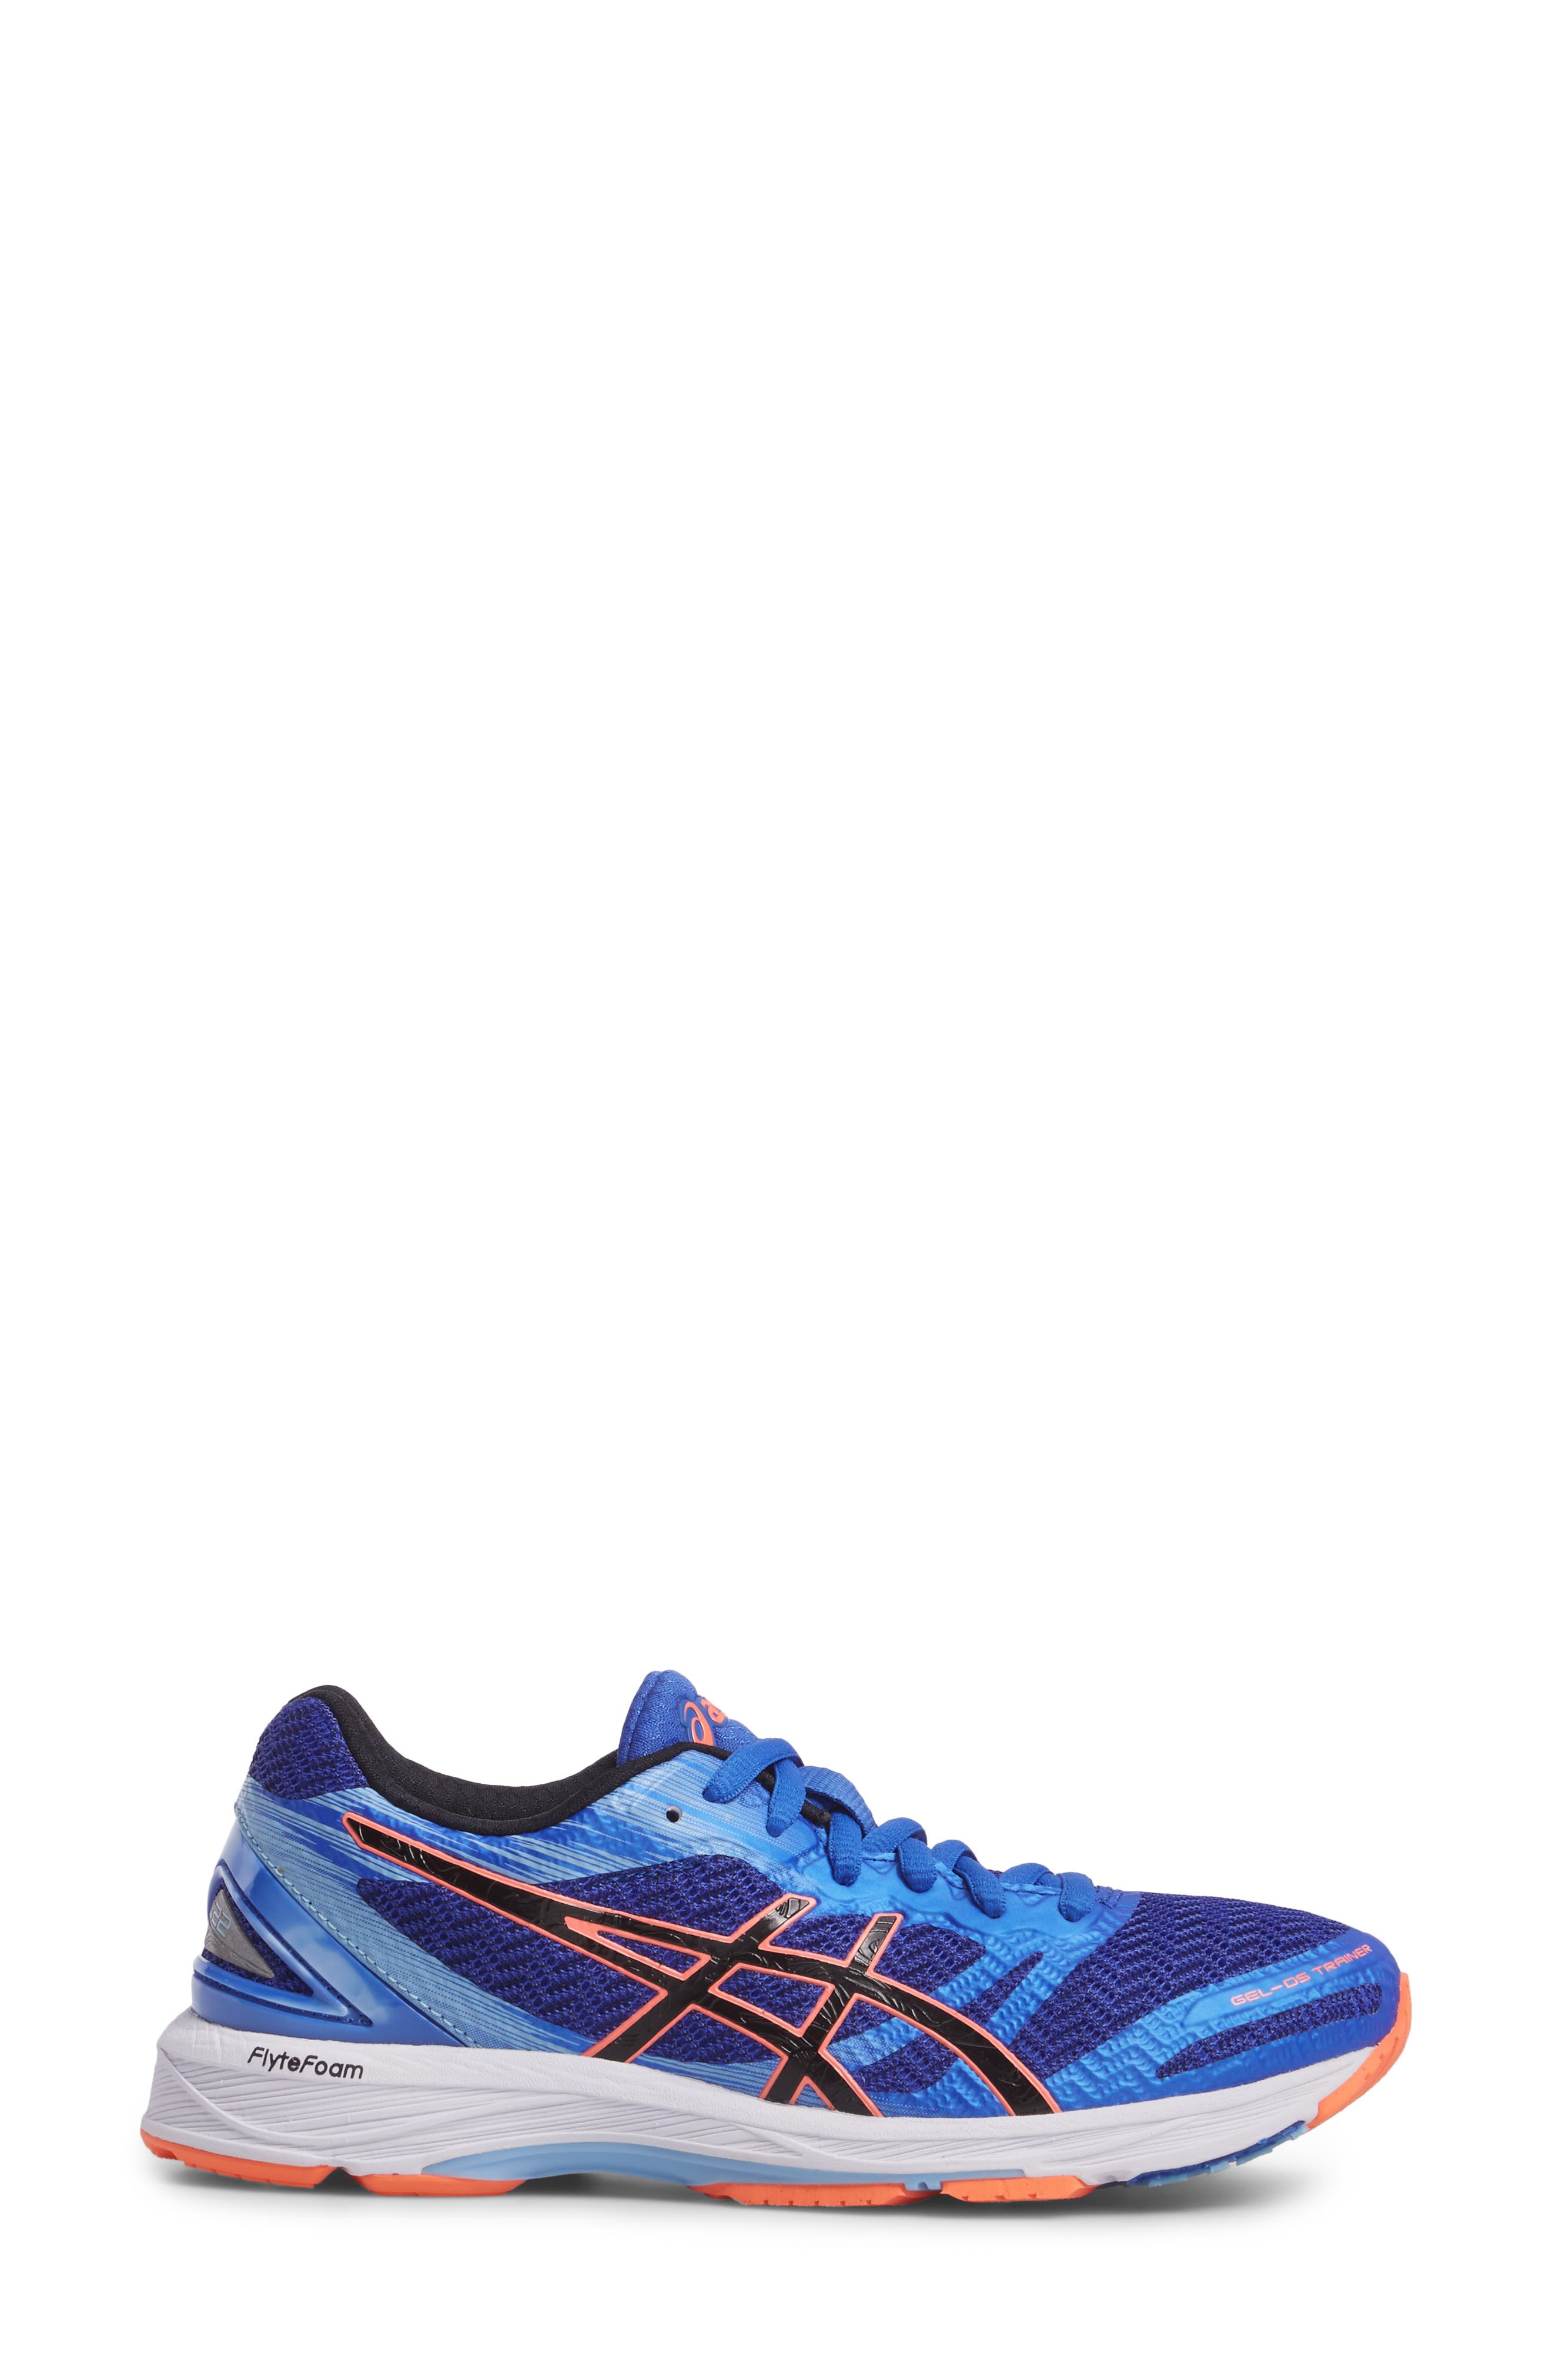 GEL-DS Trainer 22 Running Shoe,                             Alternate thumbnail 3, color,                             480